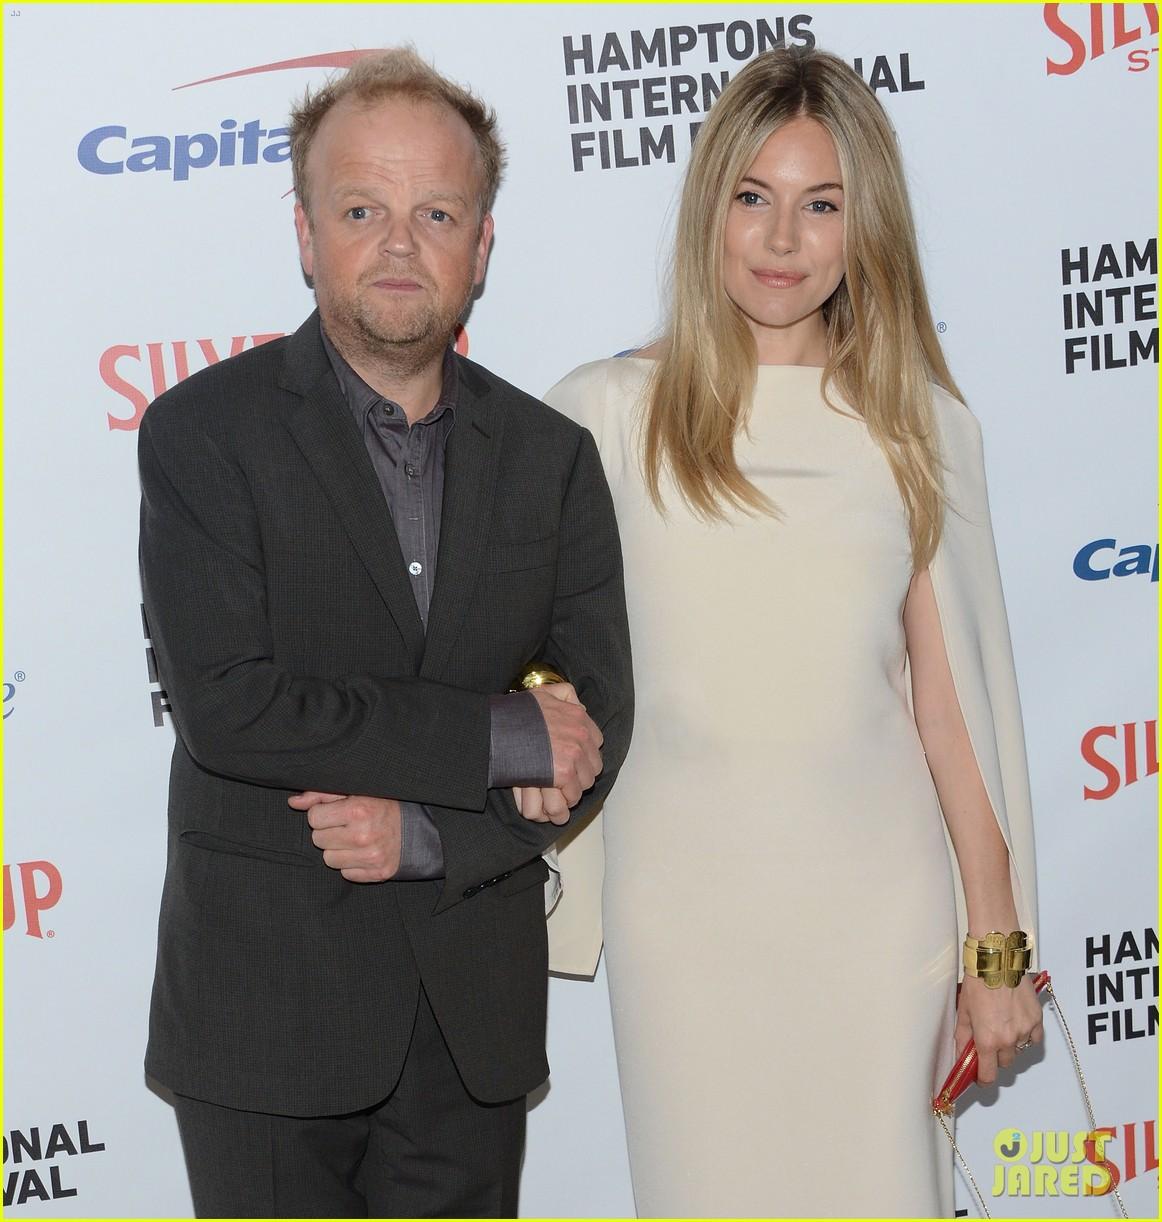 sienna miller hamptons film festival with toby jones 032734185